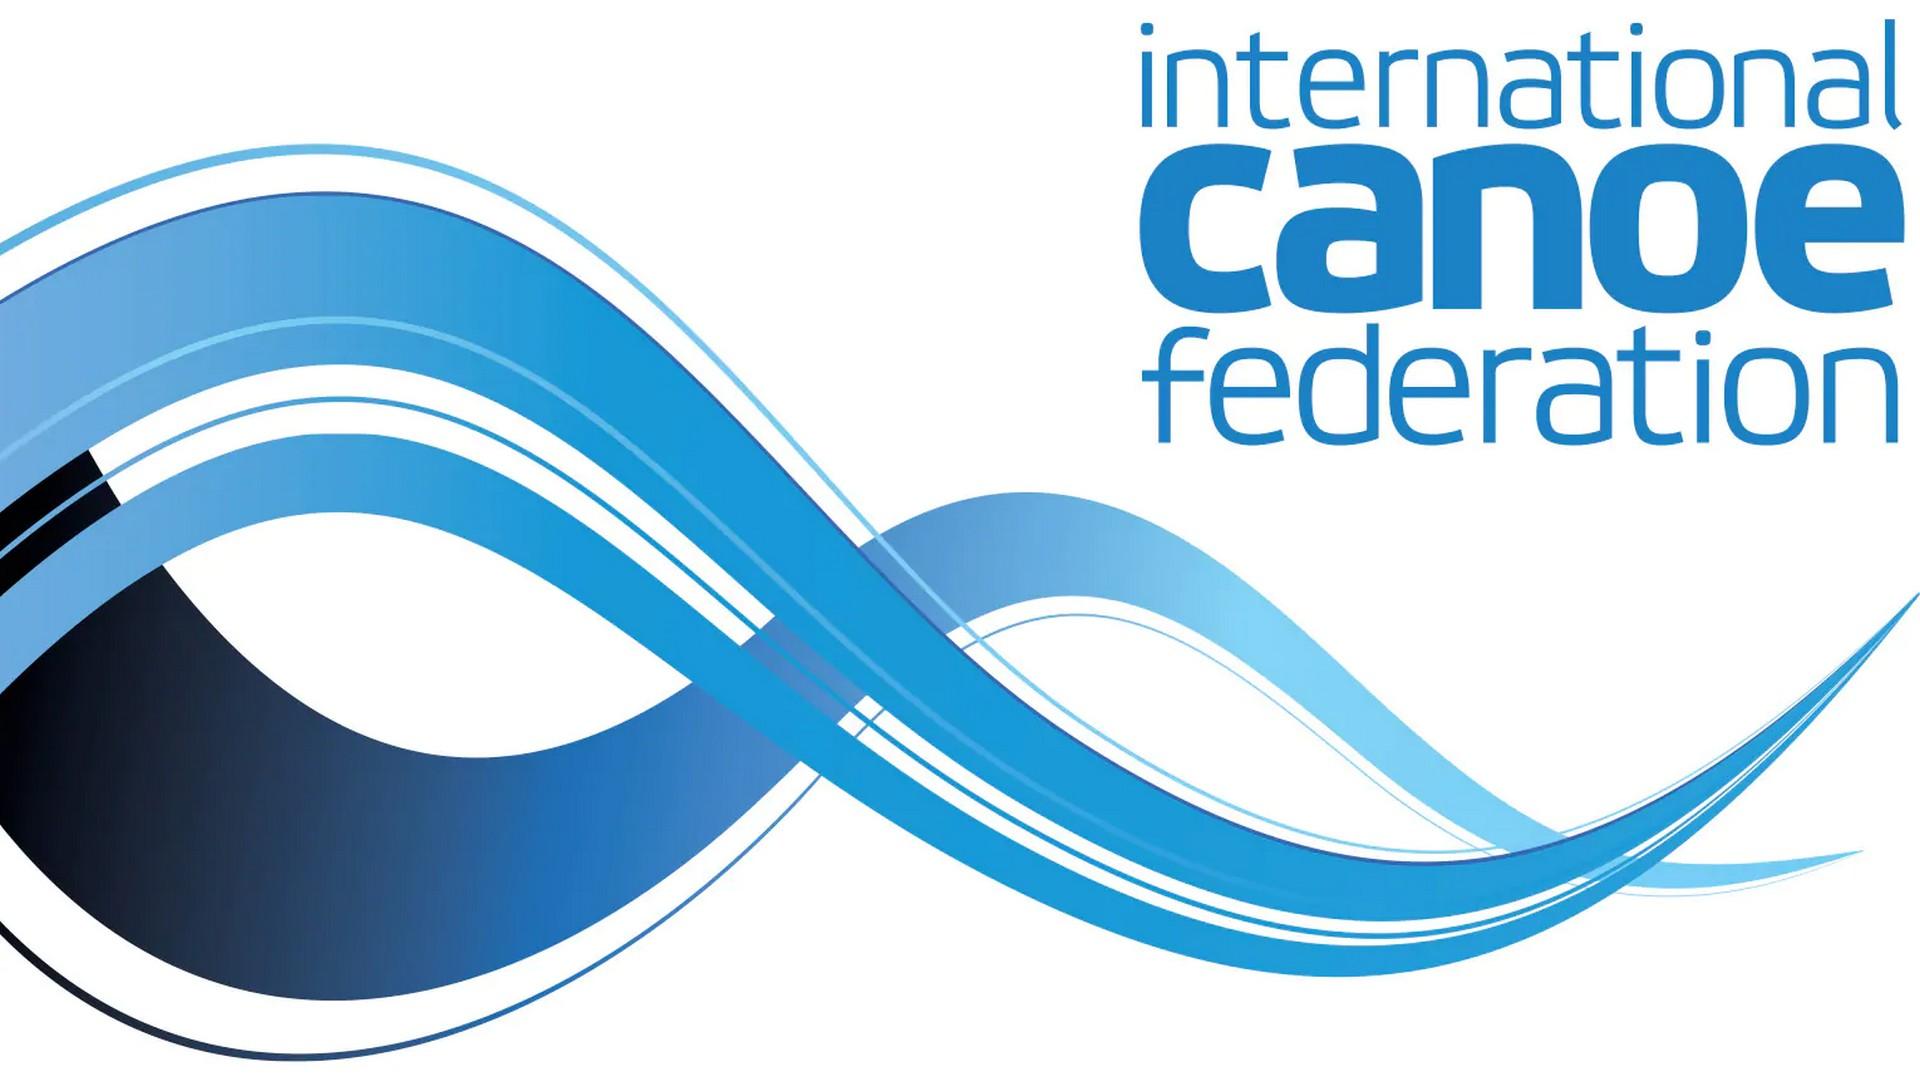 Fédération internationale de canoë ICF (1) logo